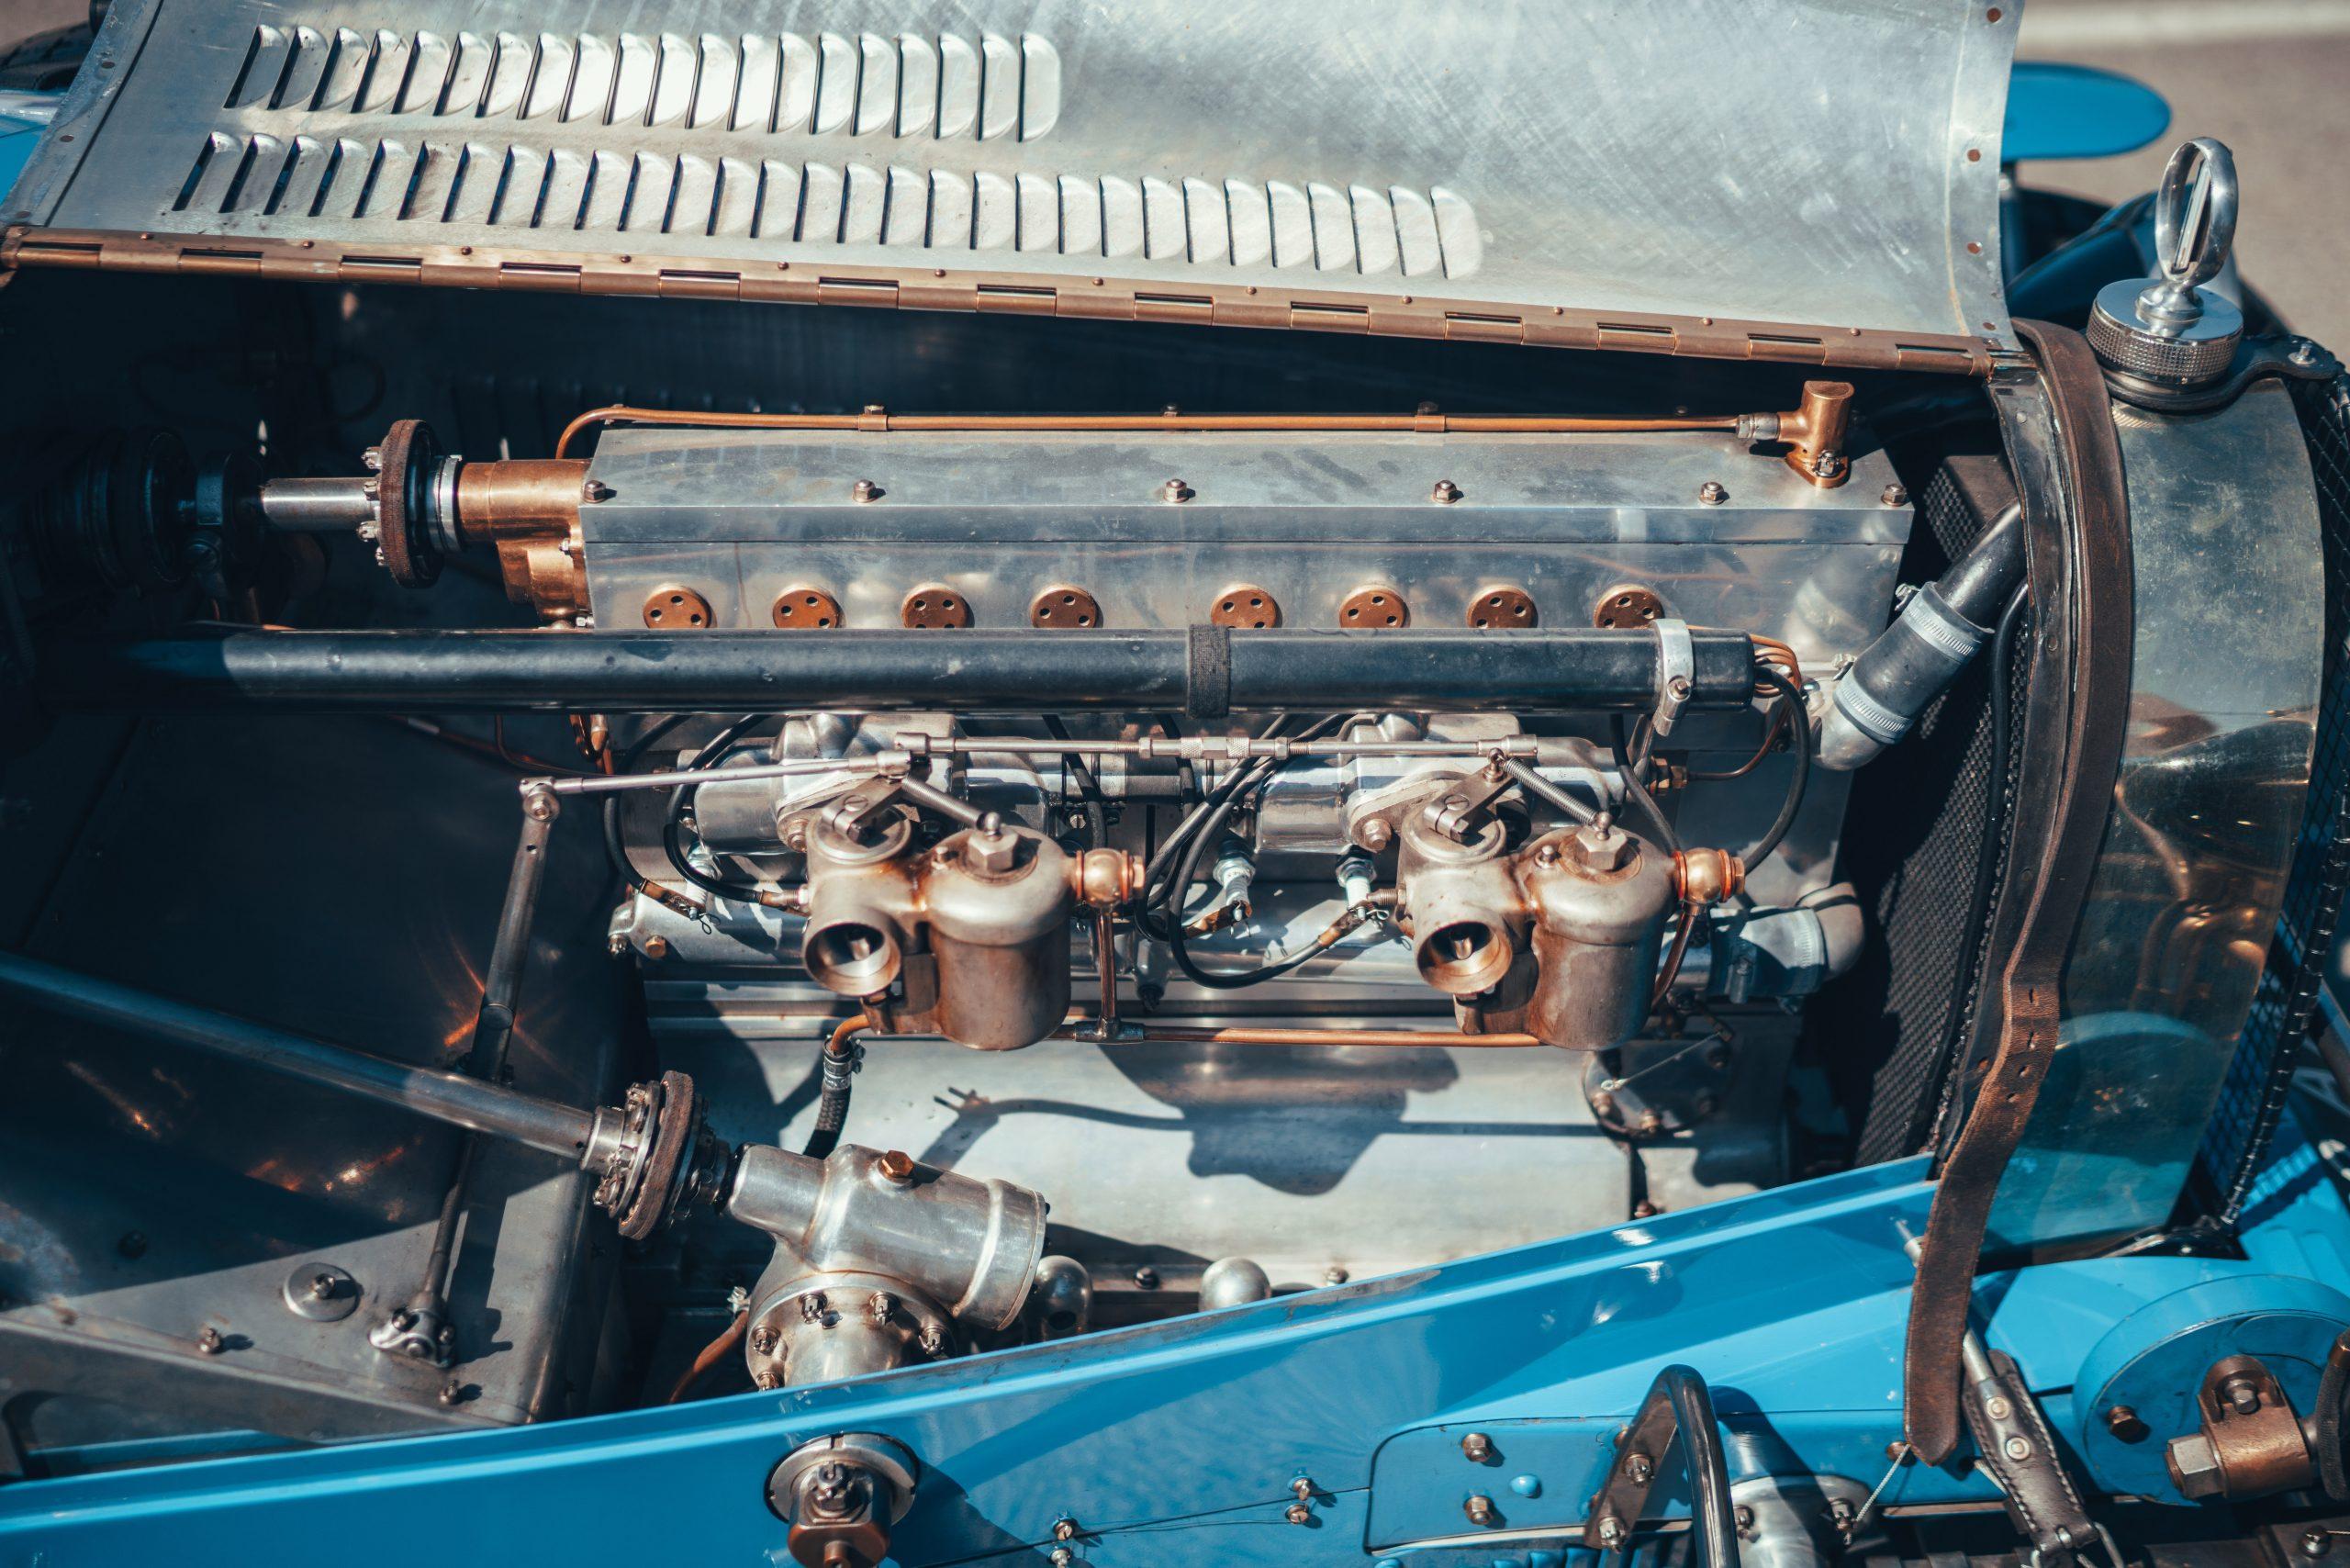 Bugatti Type 35C engine